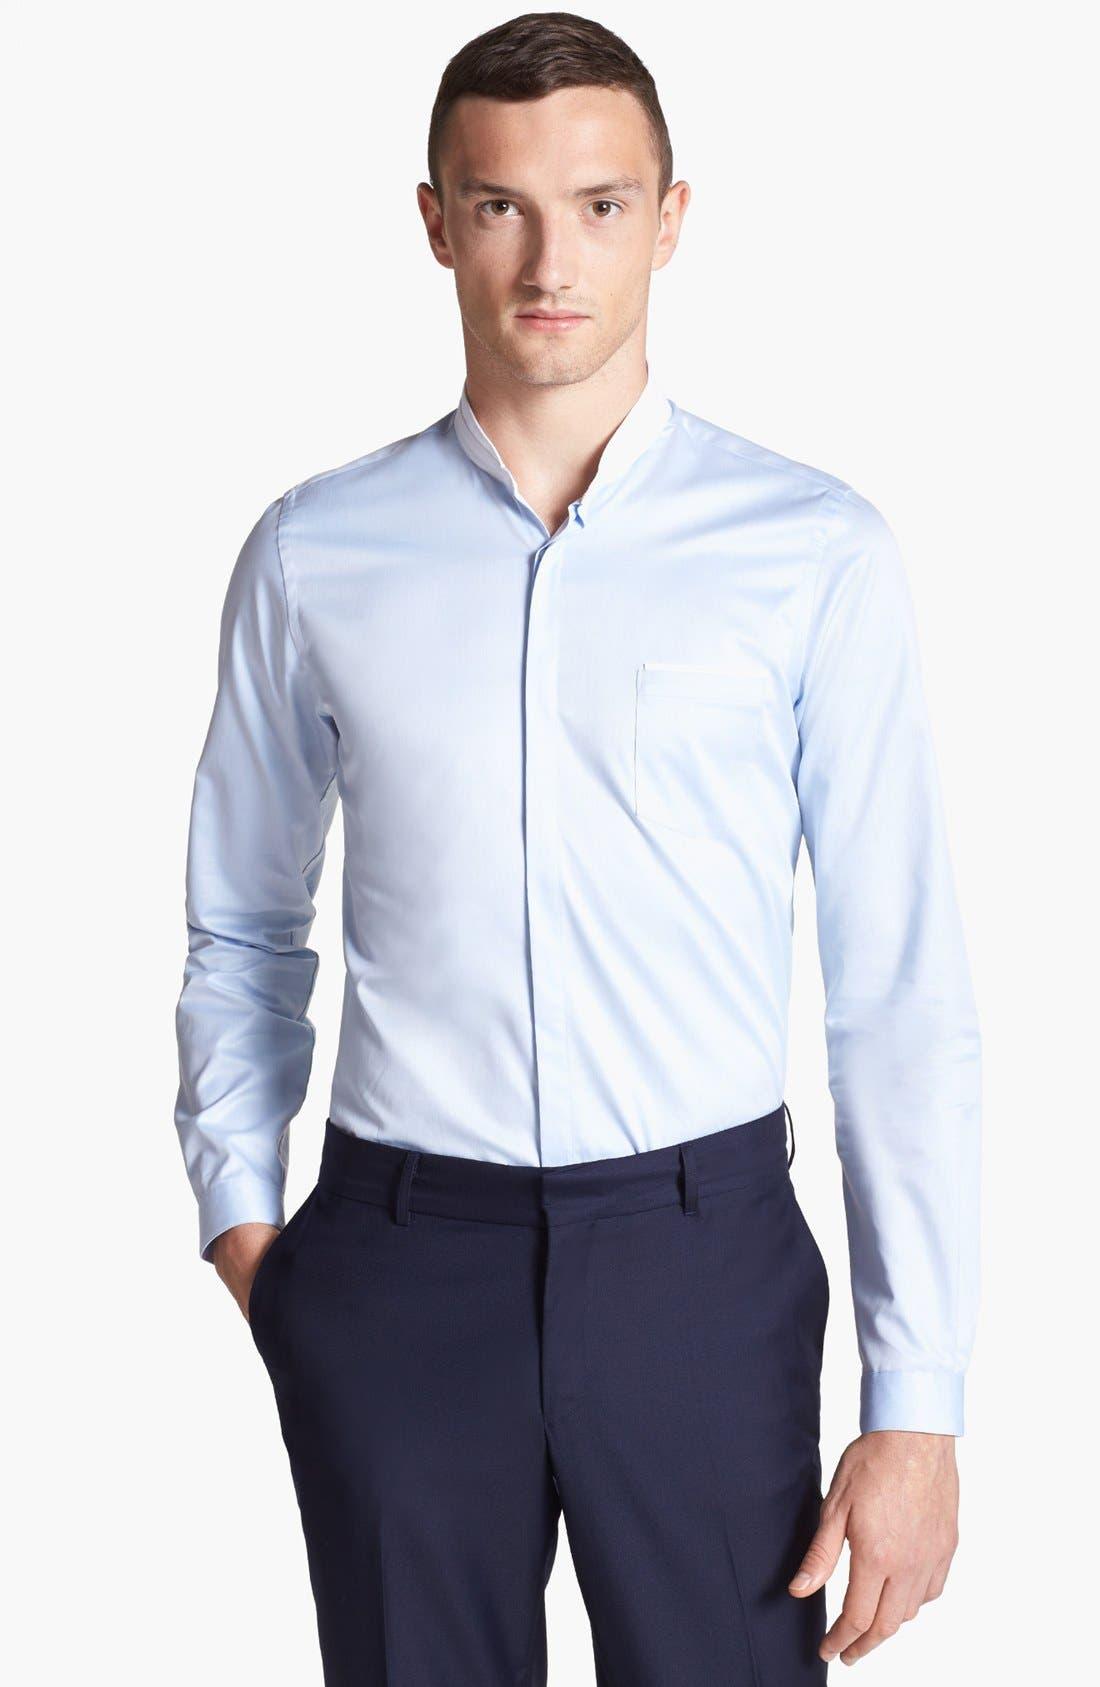 Alternate Image 1 Selected - The Kooples Round Collar Dress Shirt